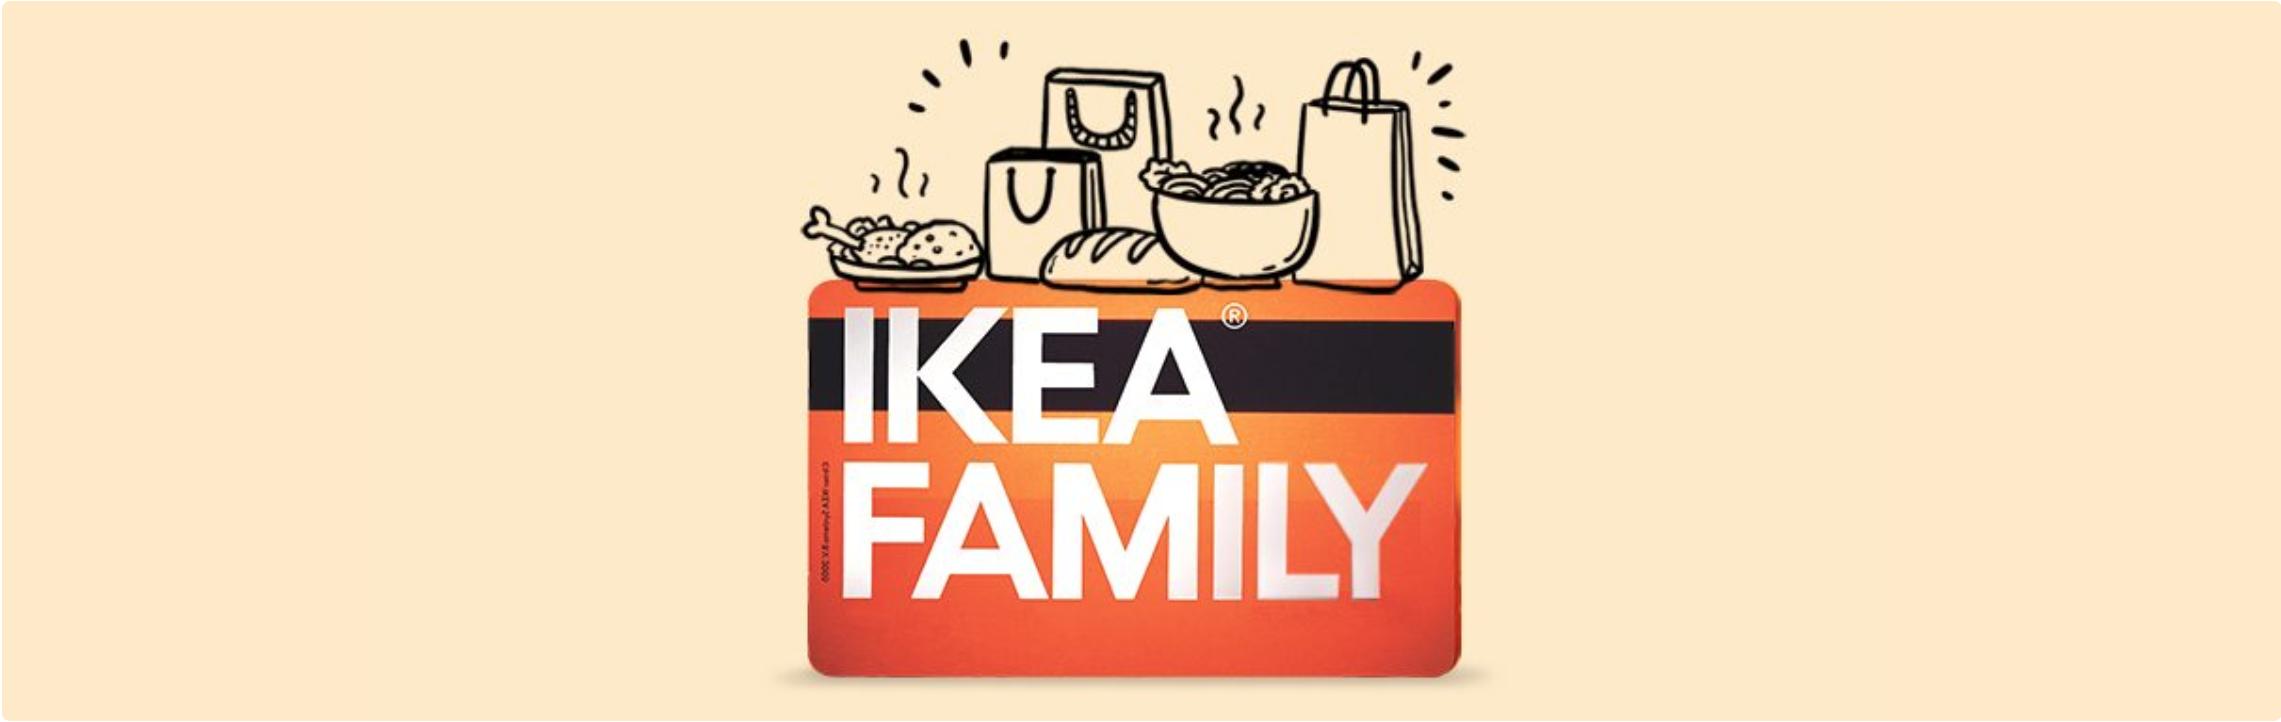 Ikea Family Member Privileges Ipc